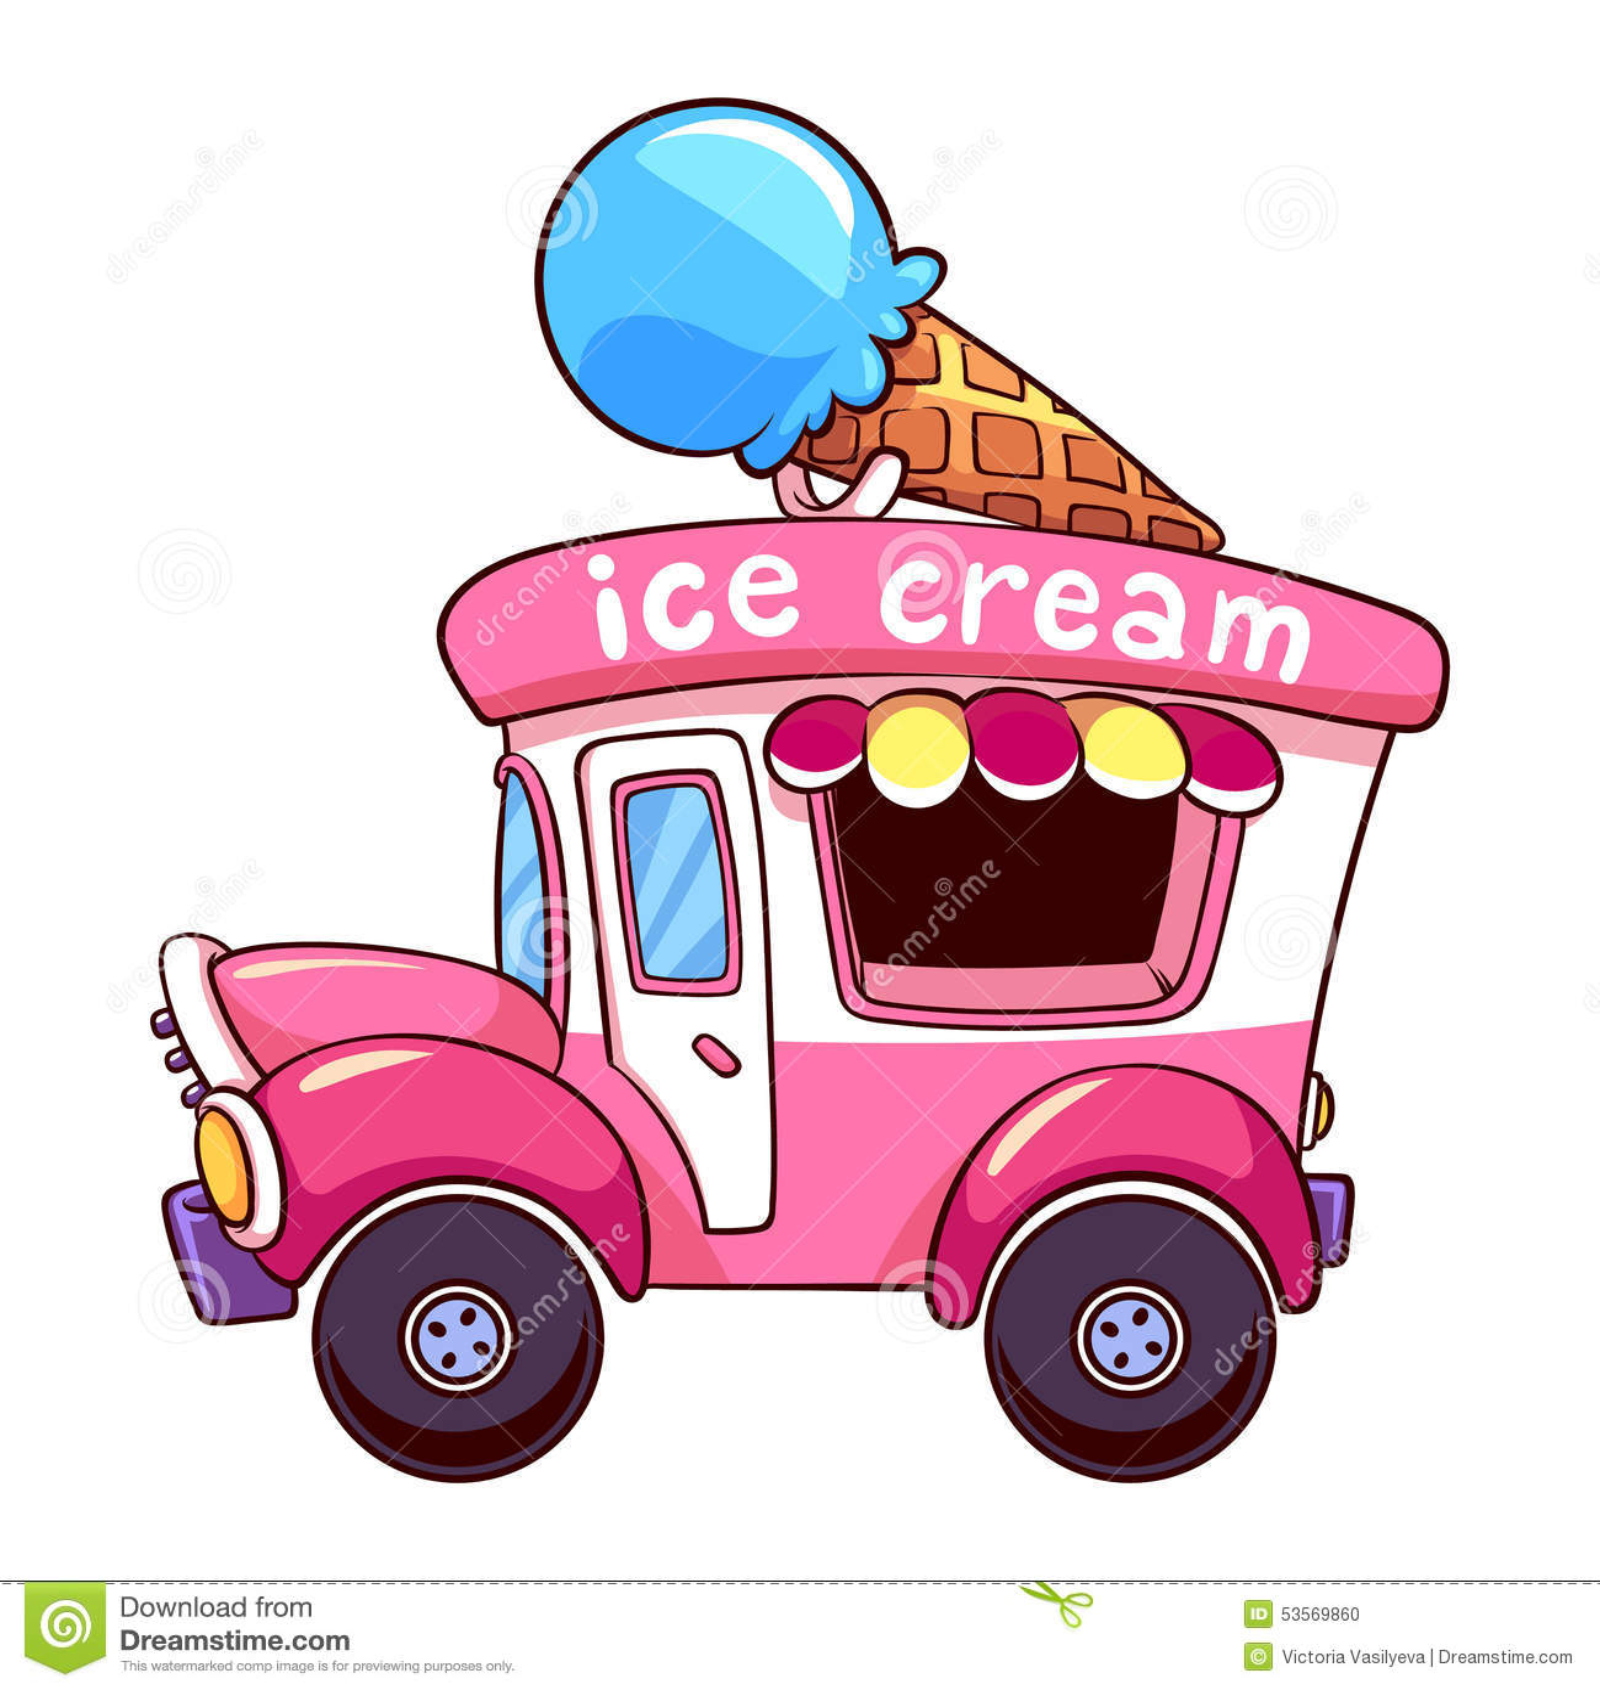 Snow Falling Gif Wallpaper Cartoon Pink Ice Cream Truck On а White Background Stock